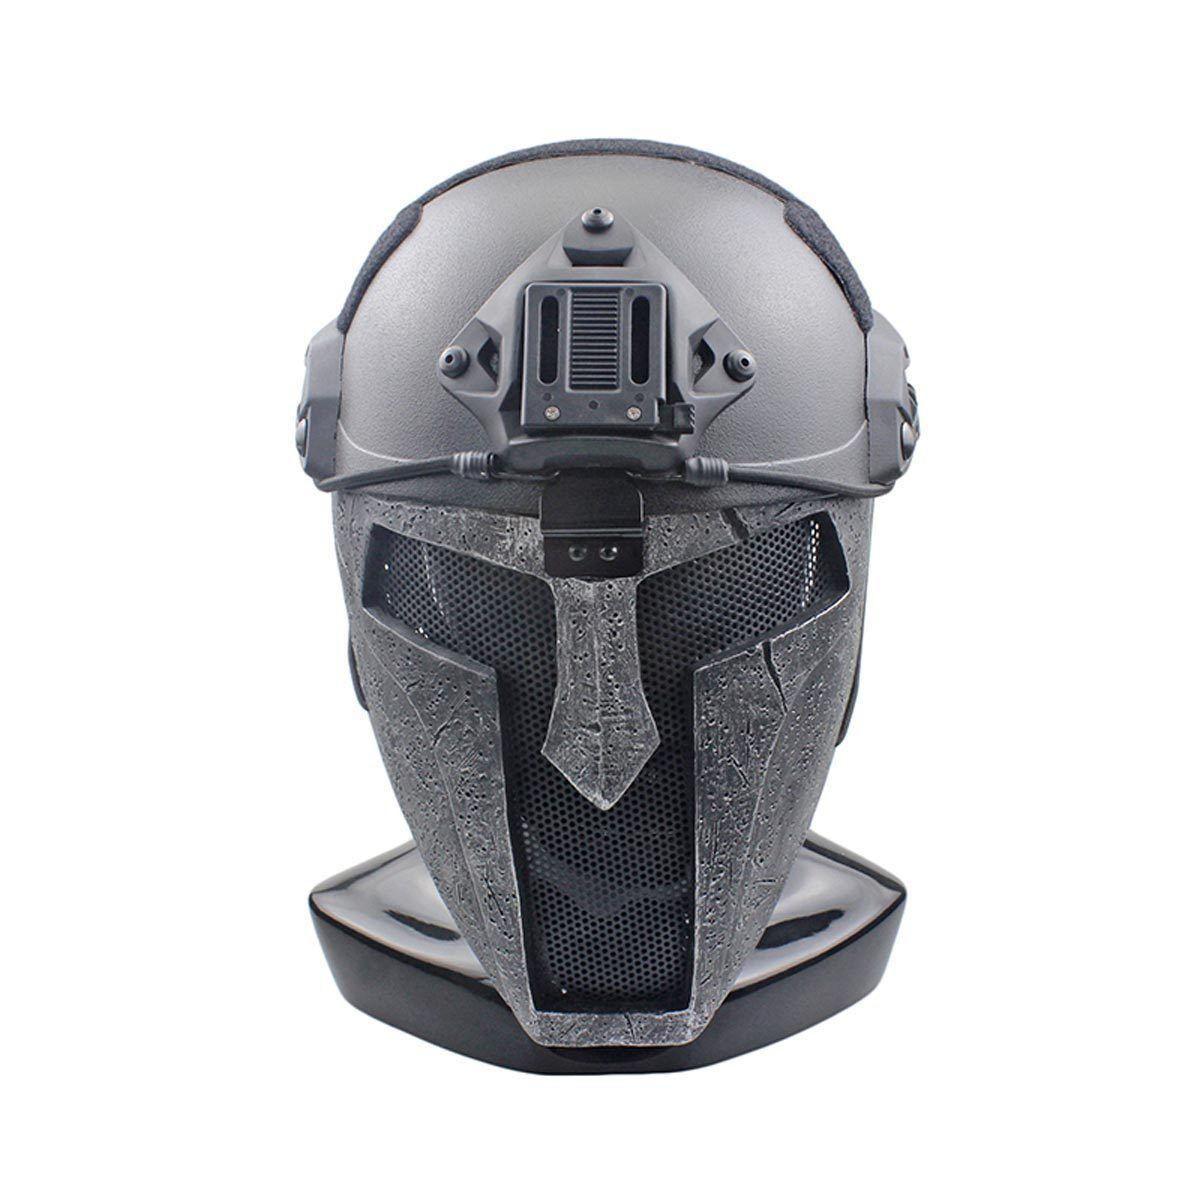 NEW Wire Mesh Glass Fiber Fiber Fiber Resin Airsoft CS Half Face Sparta Mask For Helmet M121 dcb1c0